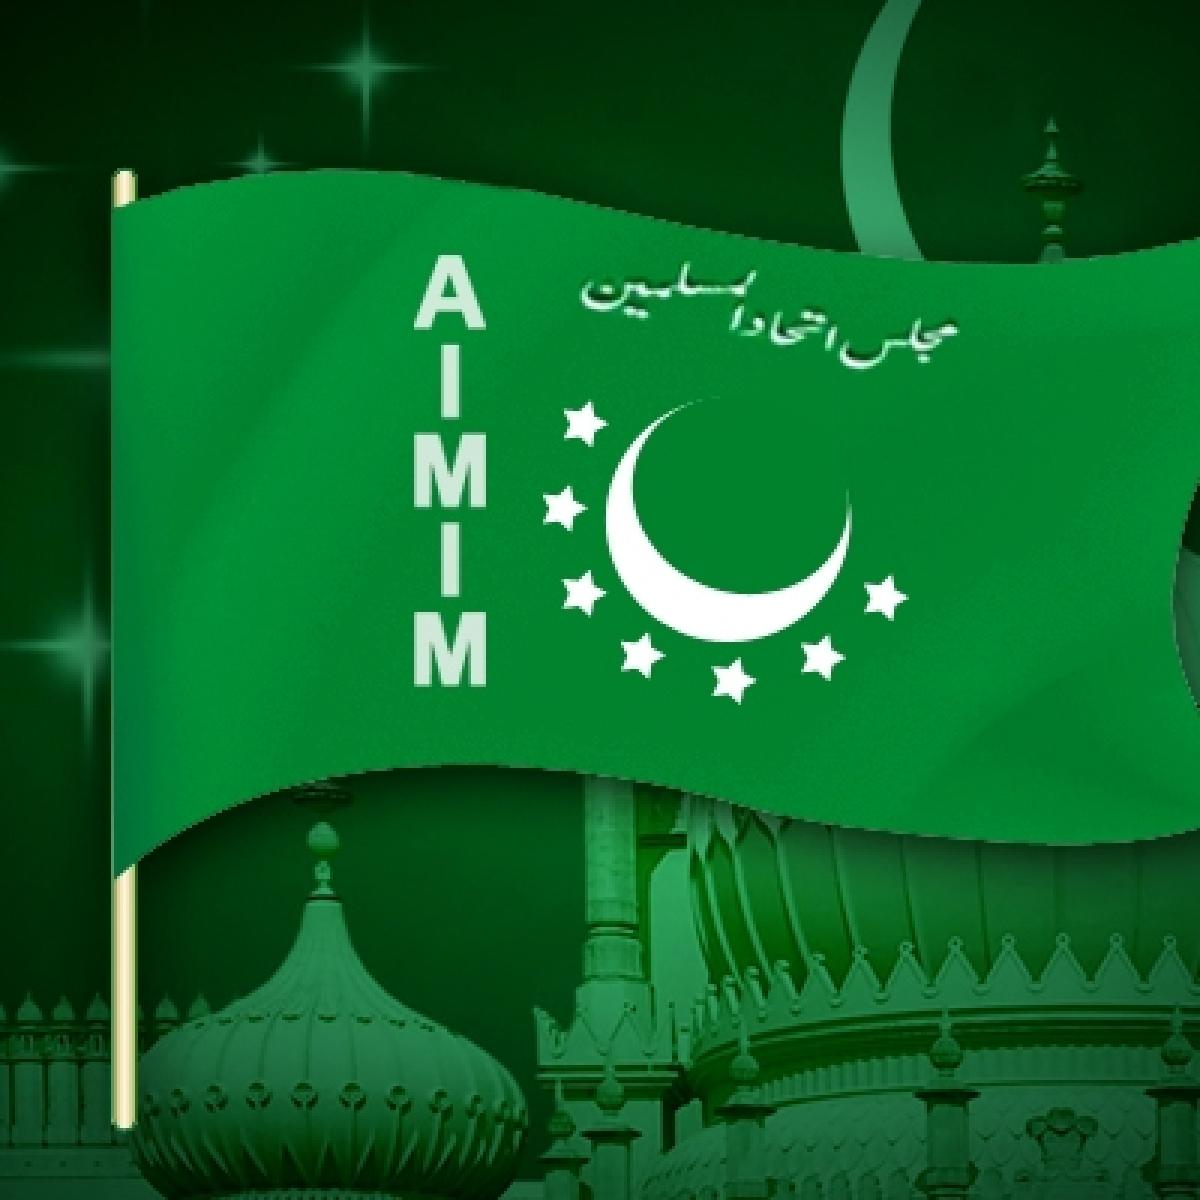 NCP demands arrest of AIMIM MP Imtiyaz Jaleel